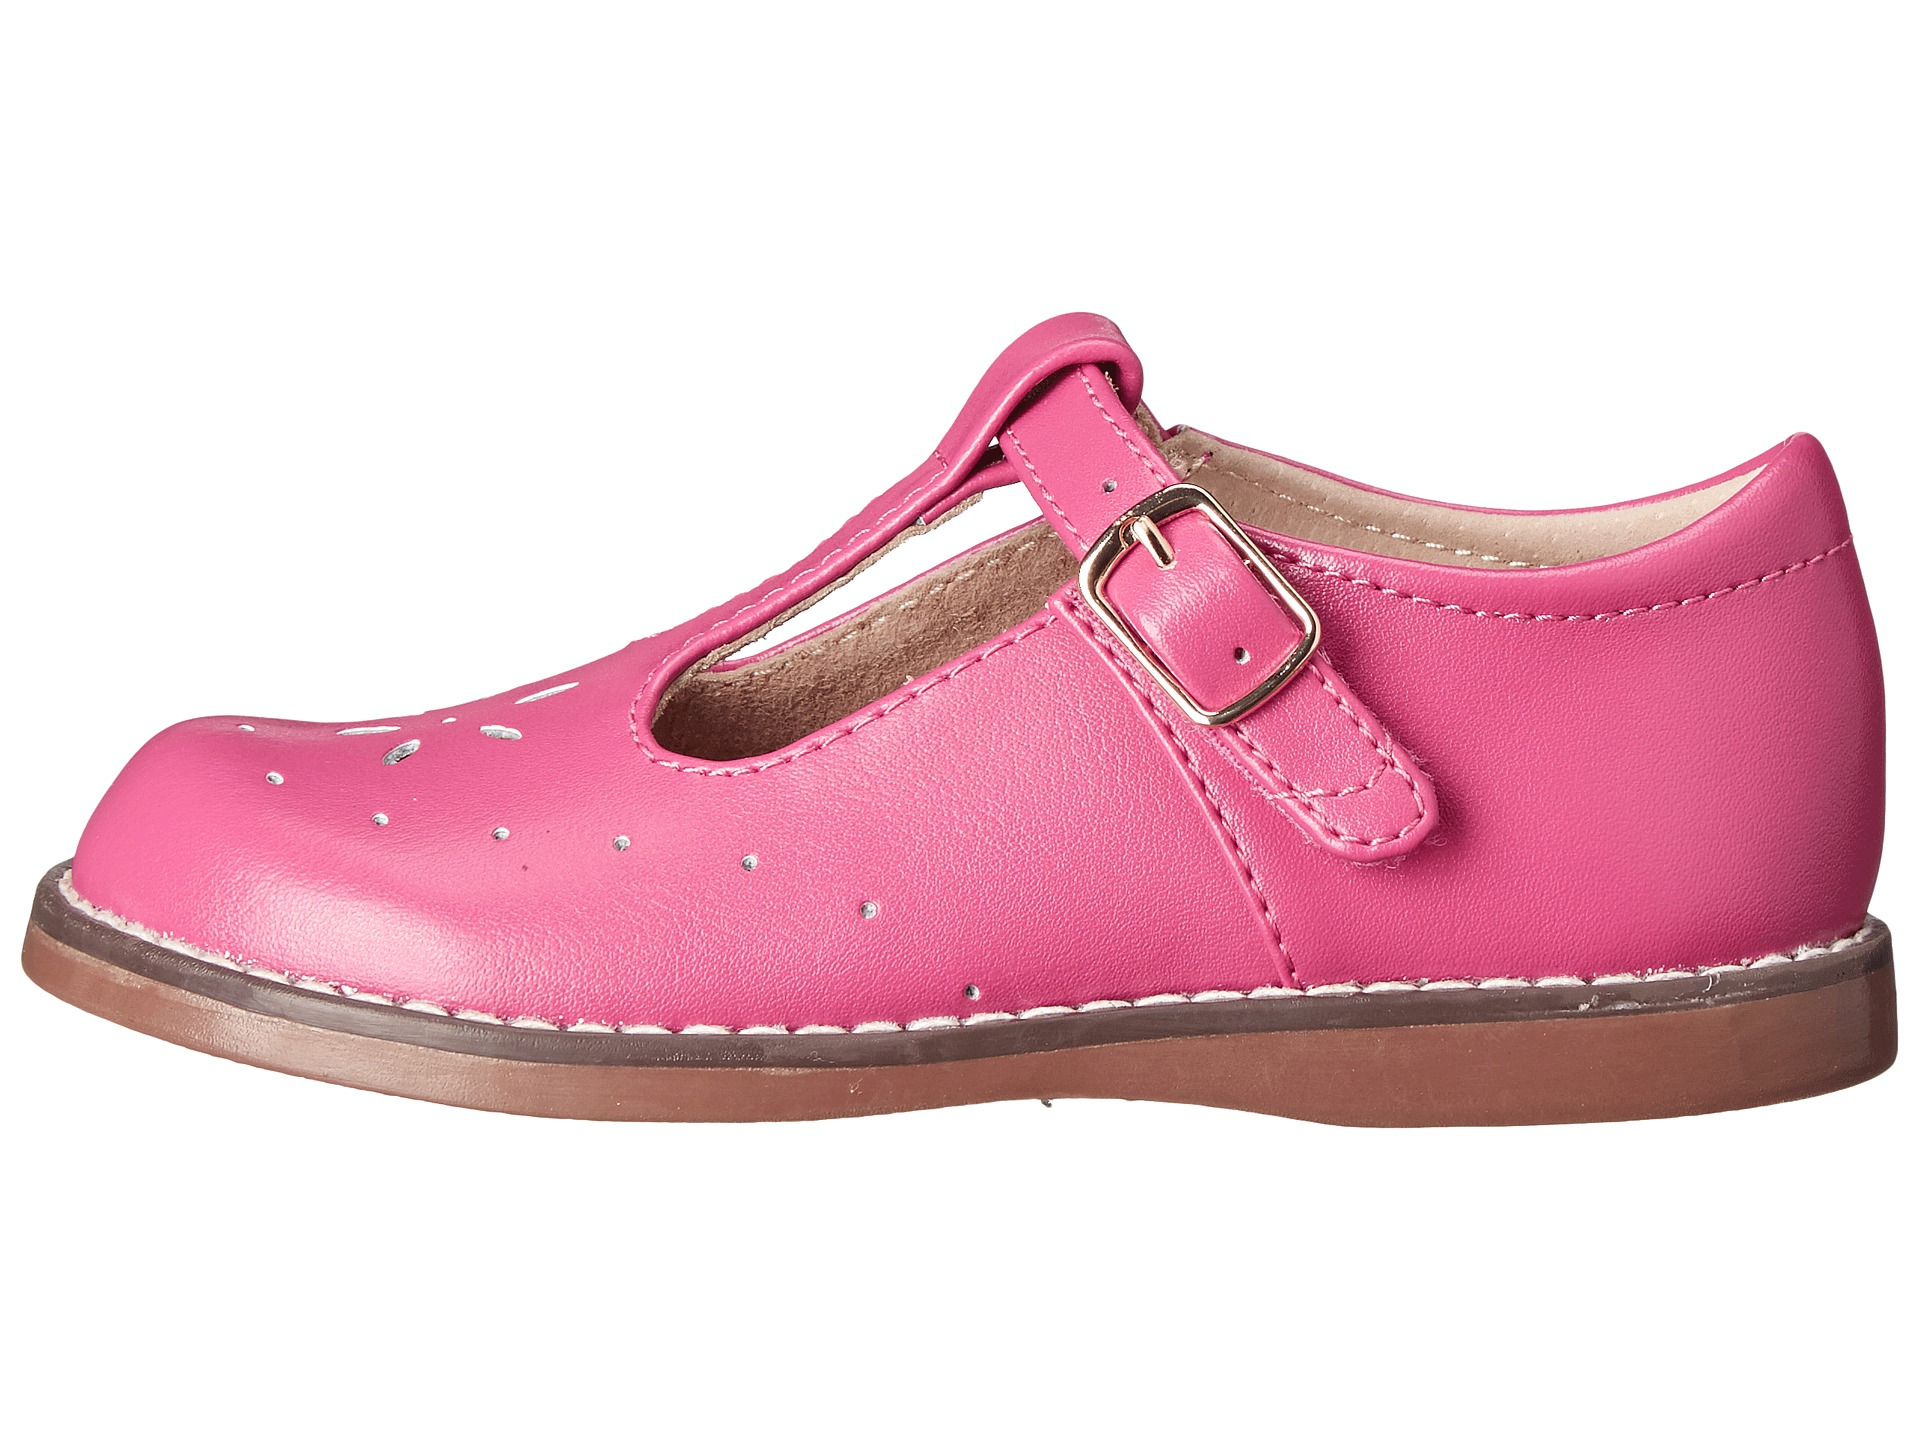 Footmates Shoes For Toddler Girls